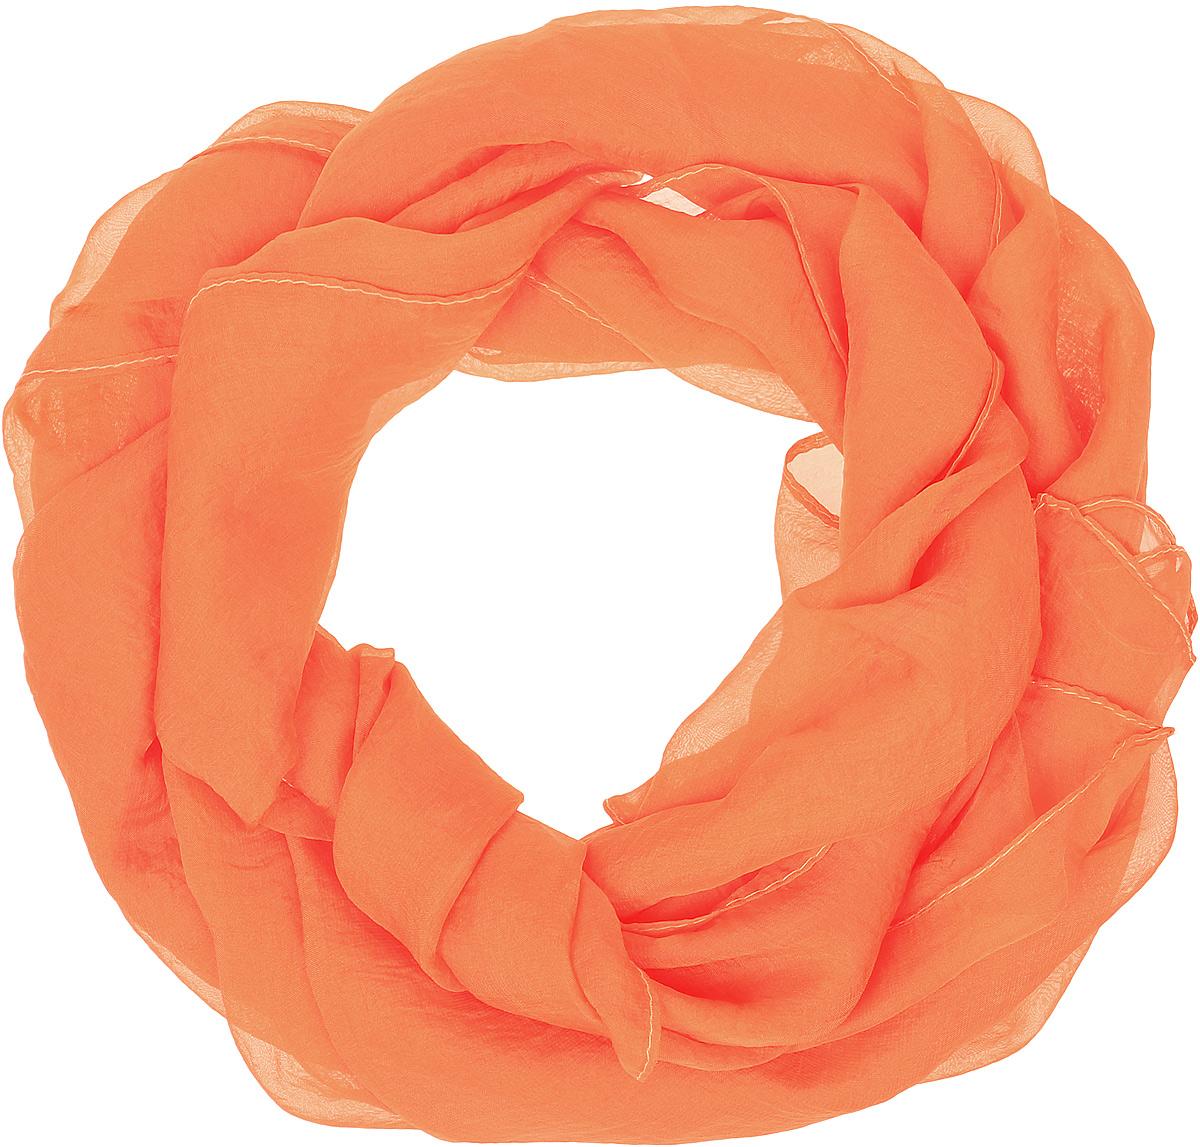 Палантин женский Vittorio Richi, цвет: оранжевый. Ro02PC3475/30. Размер 70 см х 175 смRo02PC3475/30Однотонный палантин. Край - подрубка.